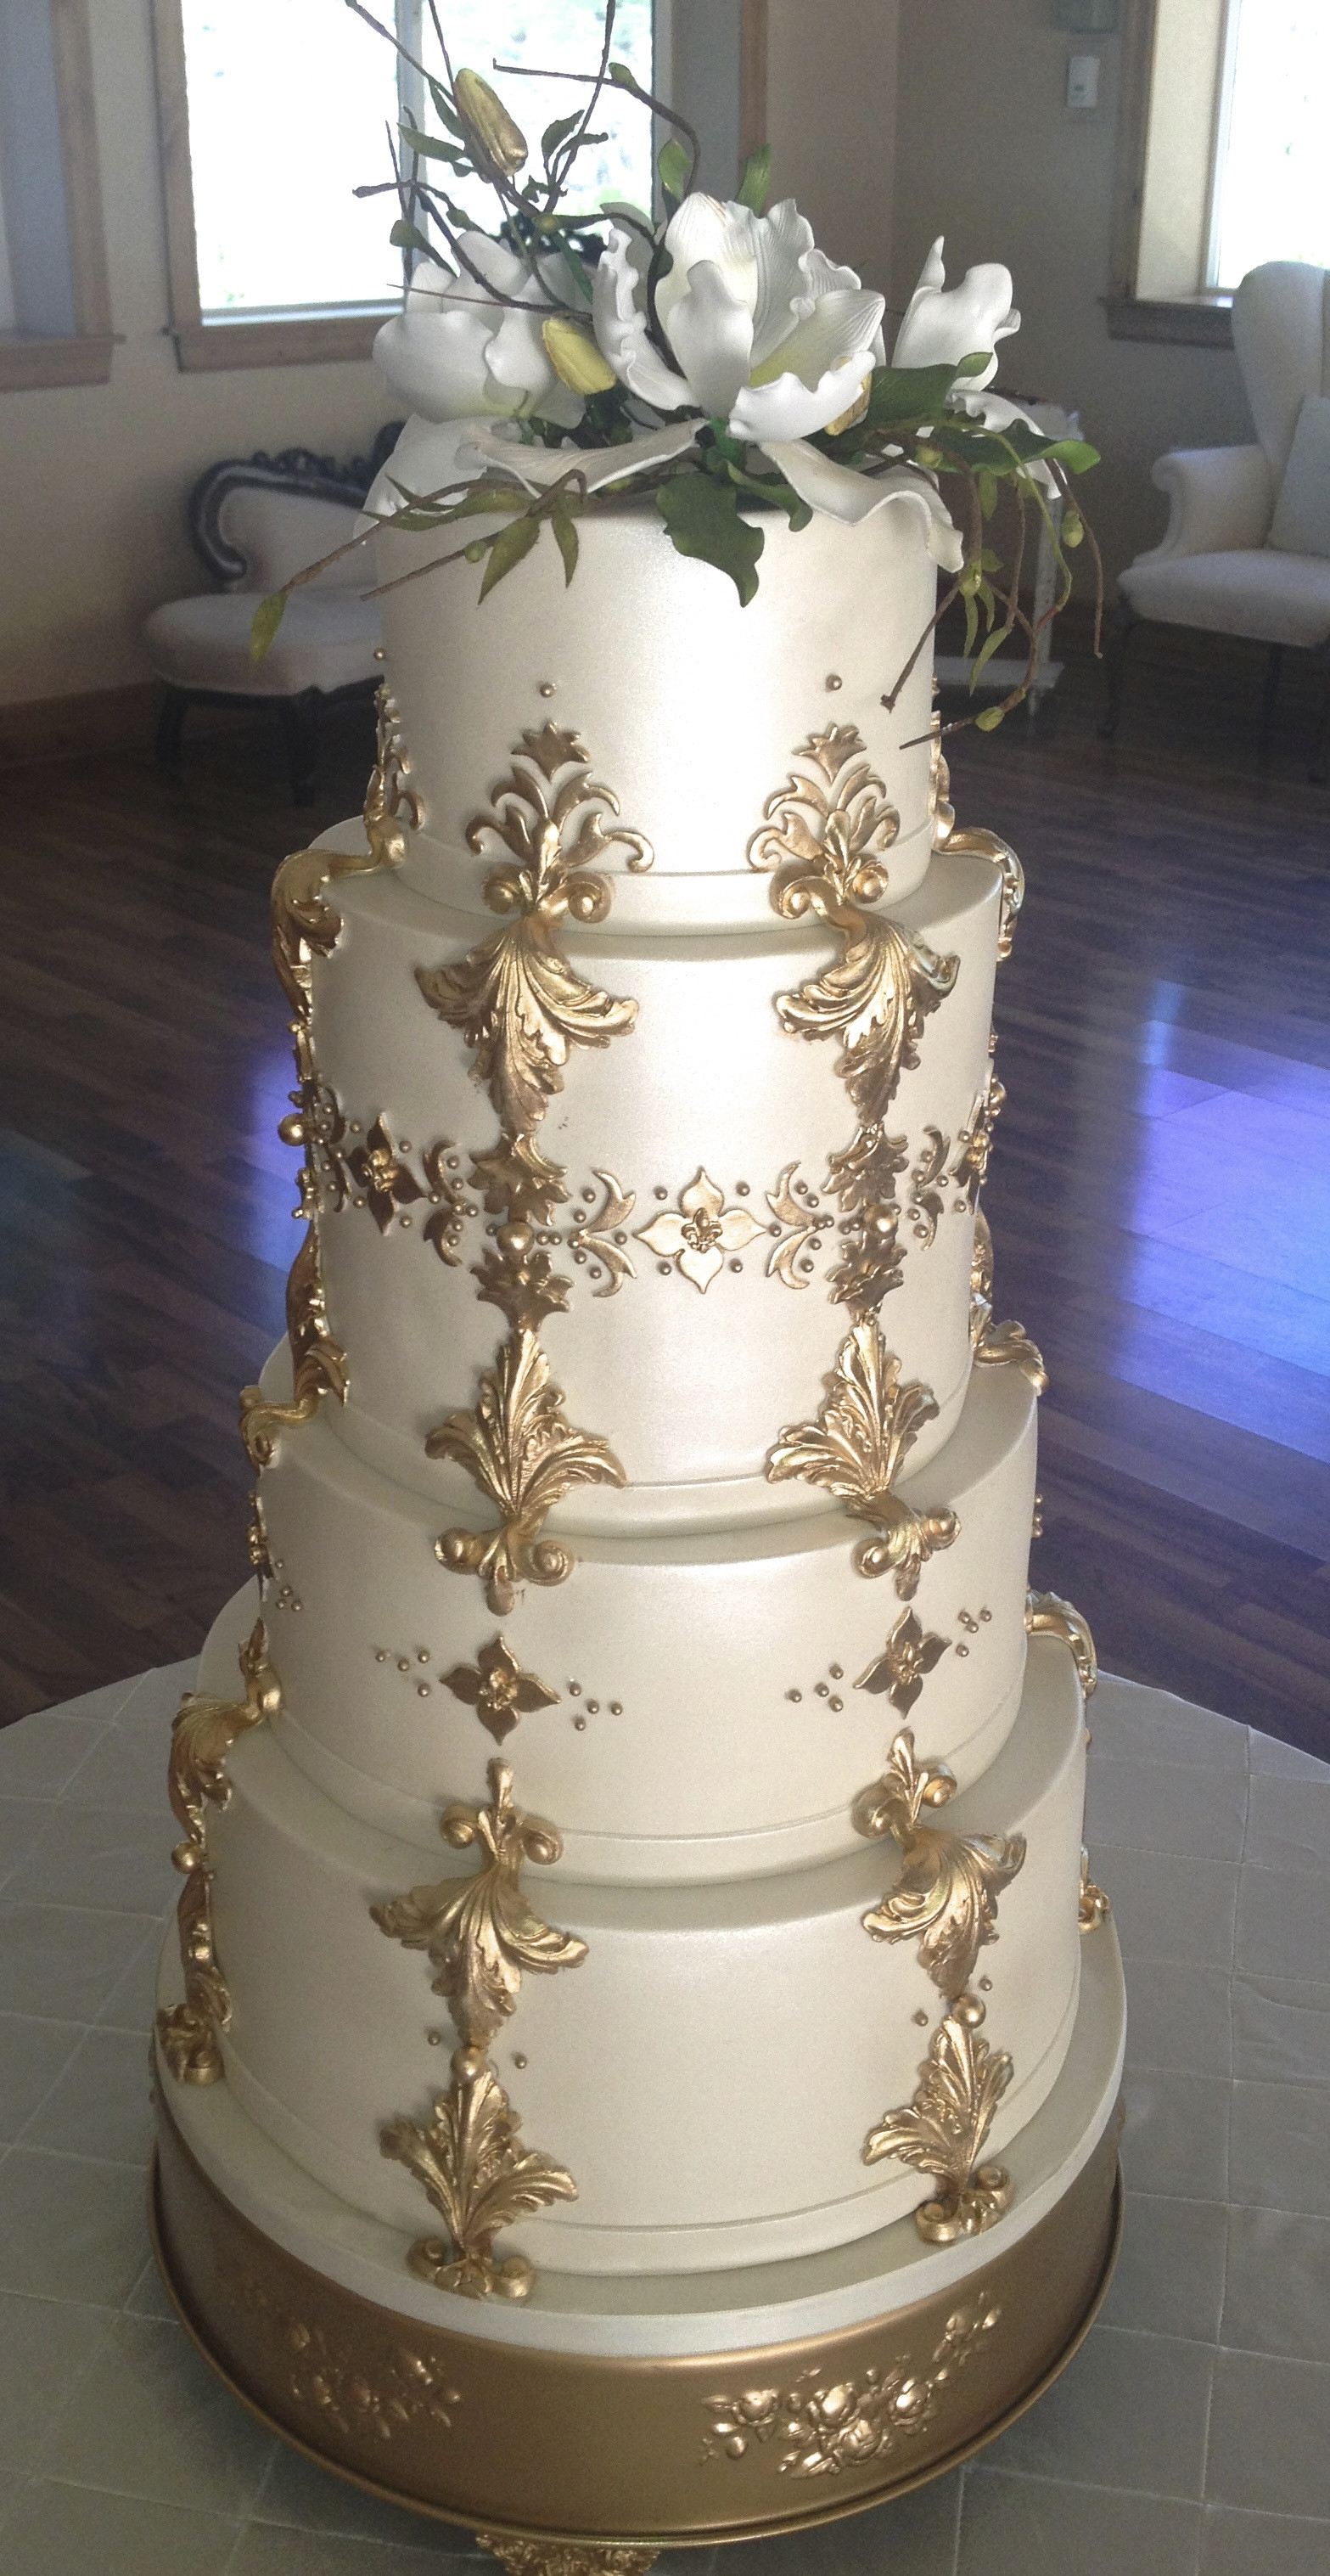 Wedding Cakes In Utah the 20 Best Ideas for Wedding Cakes Utah County